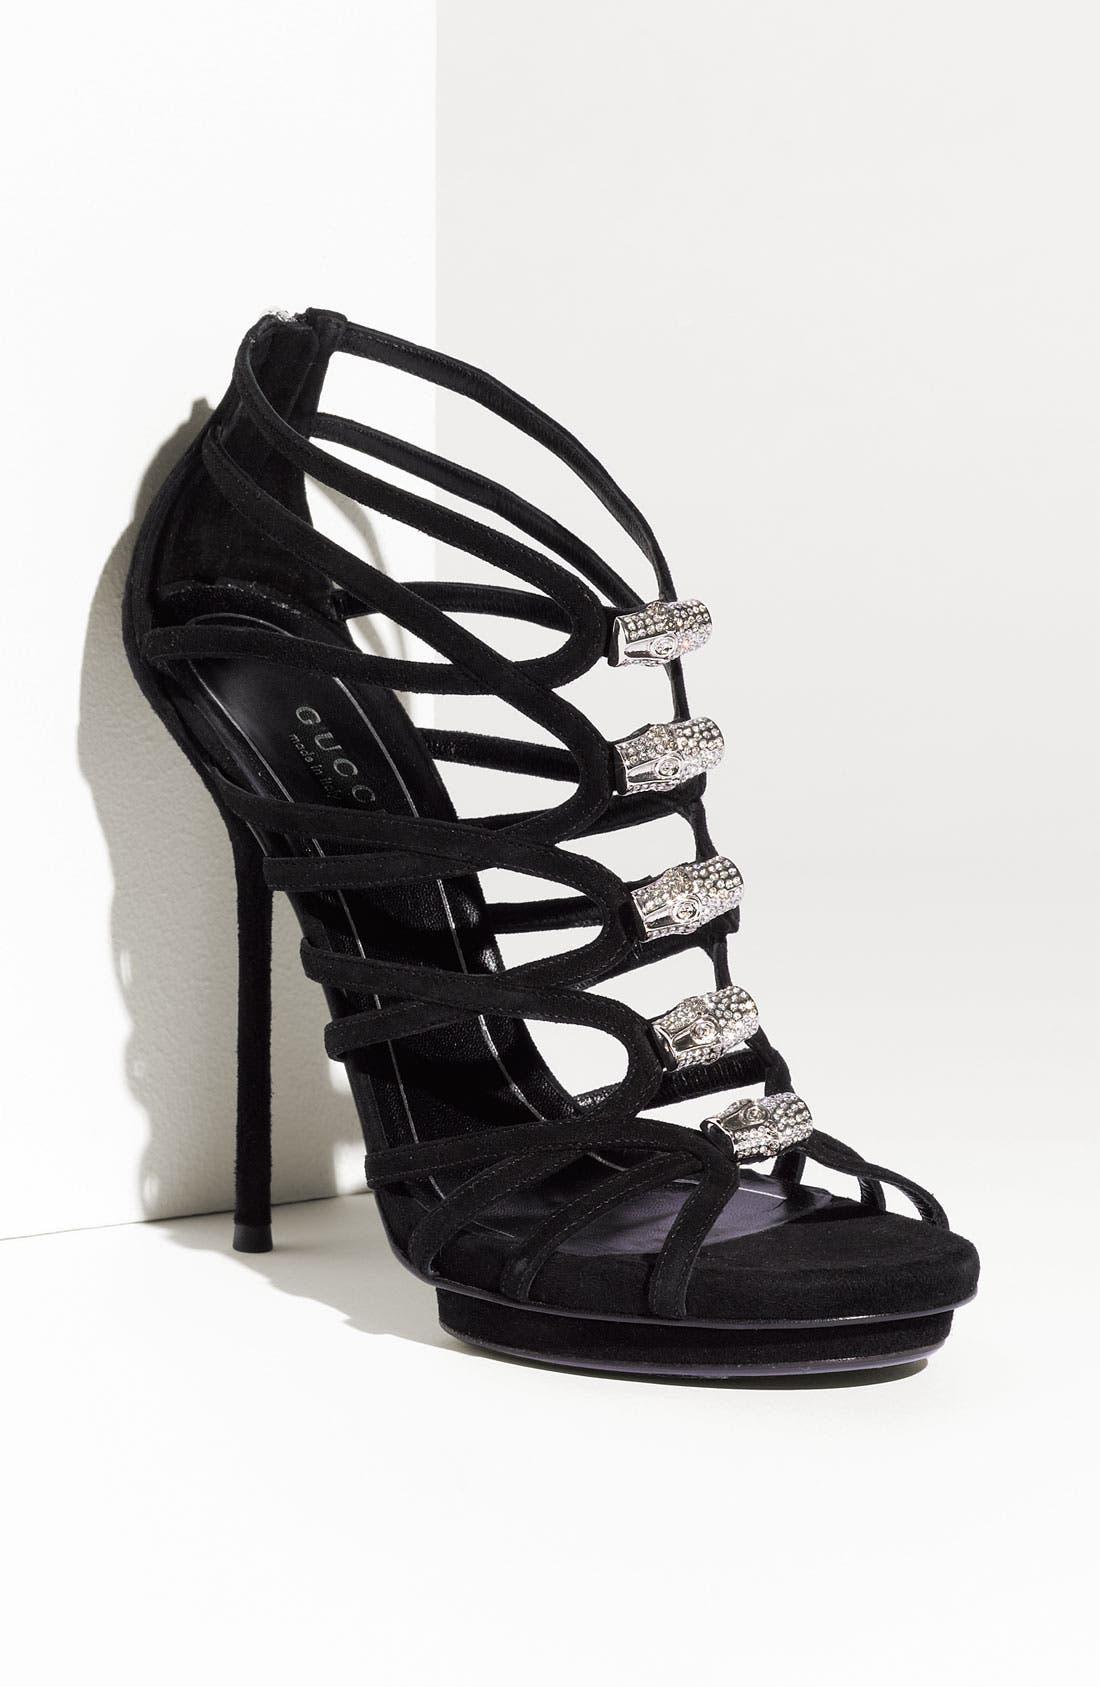 Main Image - Gucci 'Jenna' Caged Platform Sandal